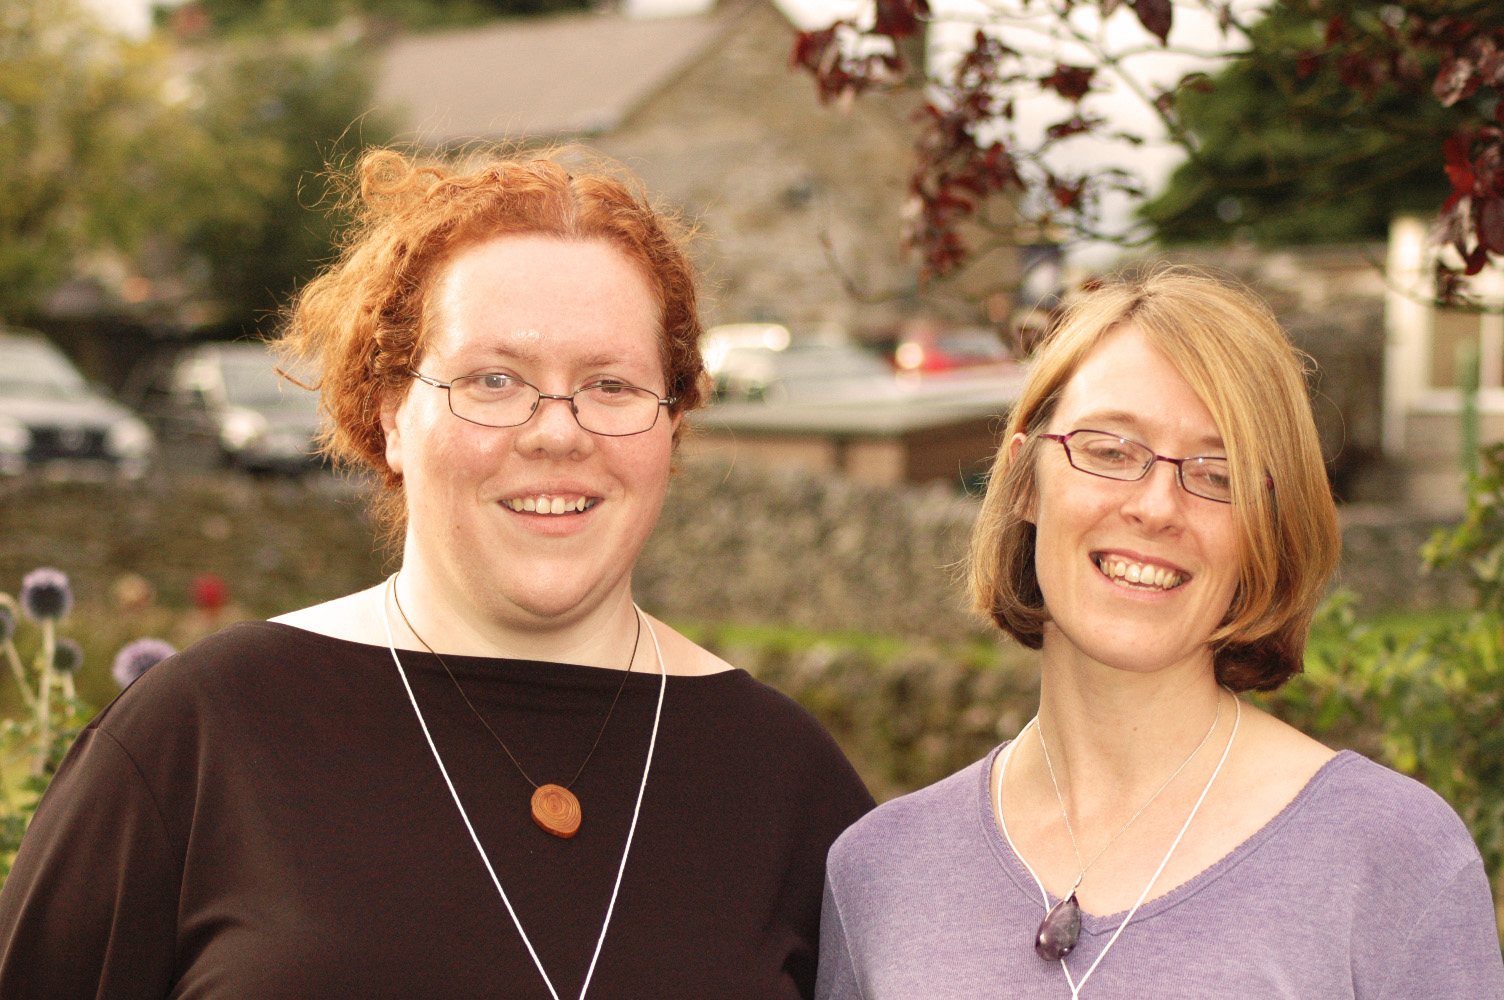 Jane and Sheena